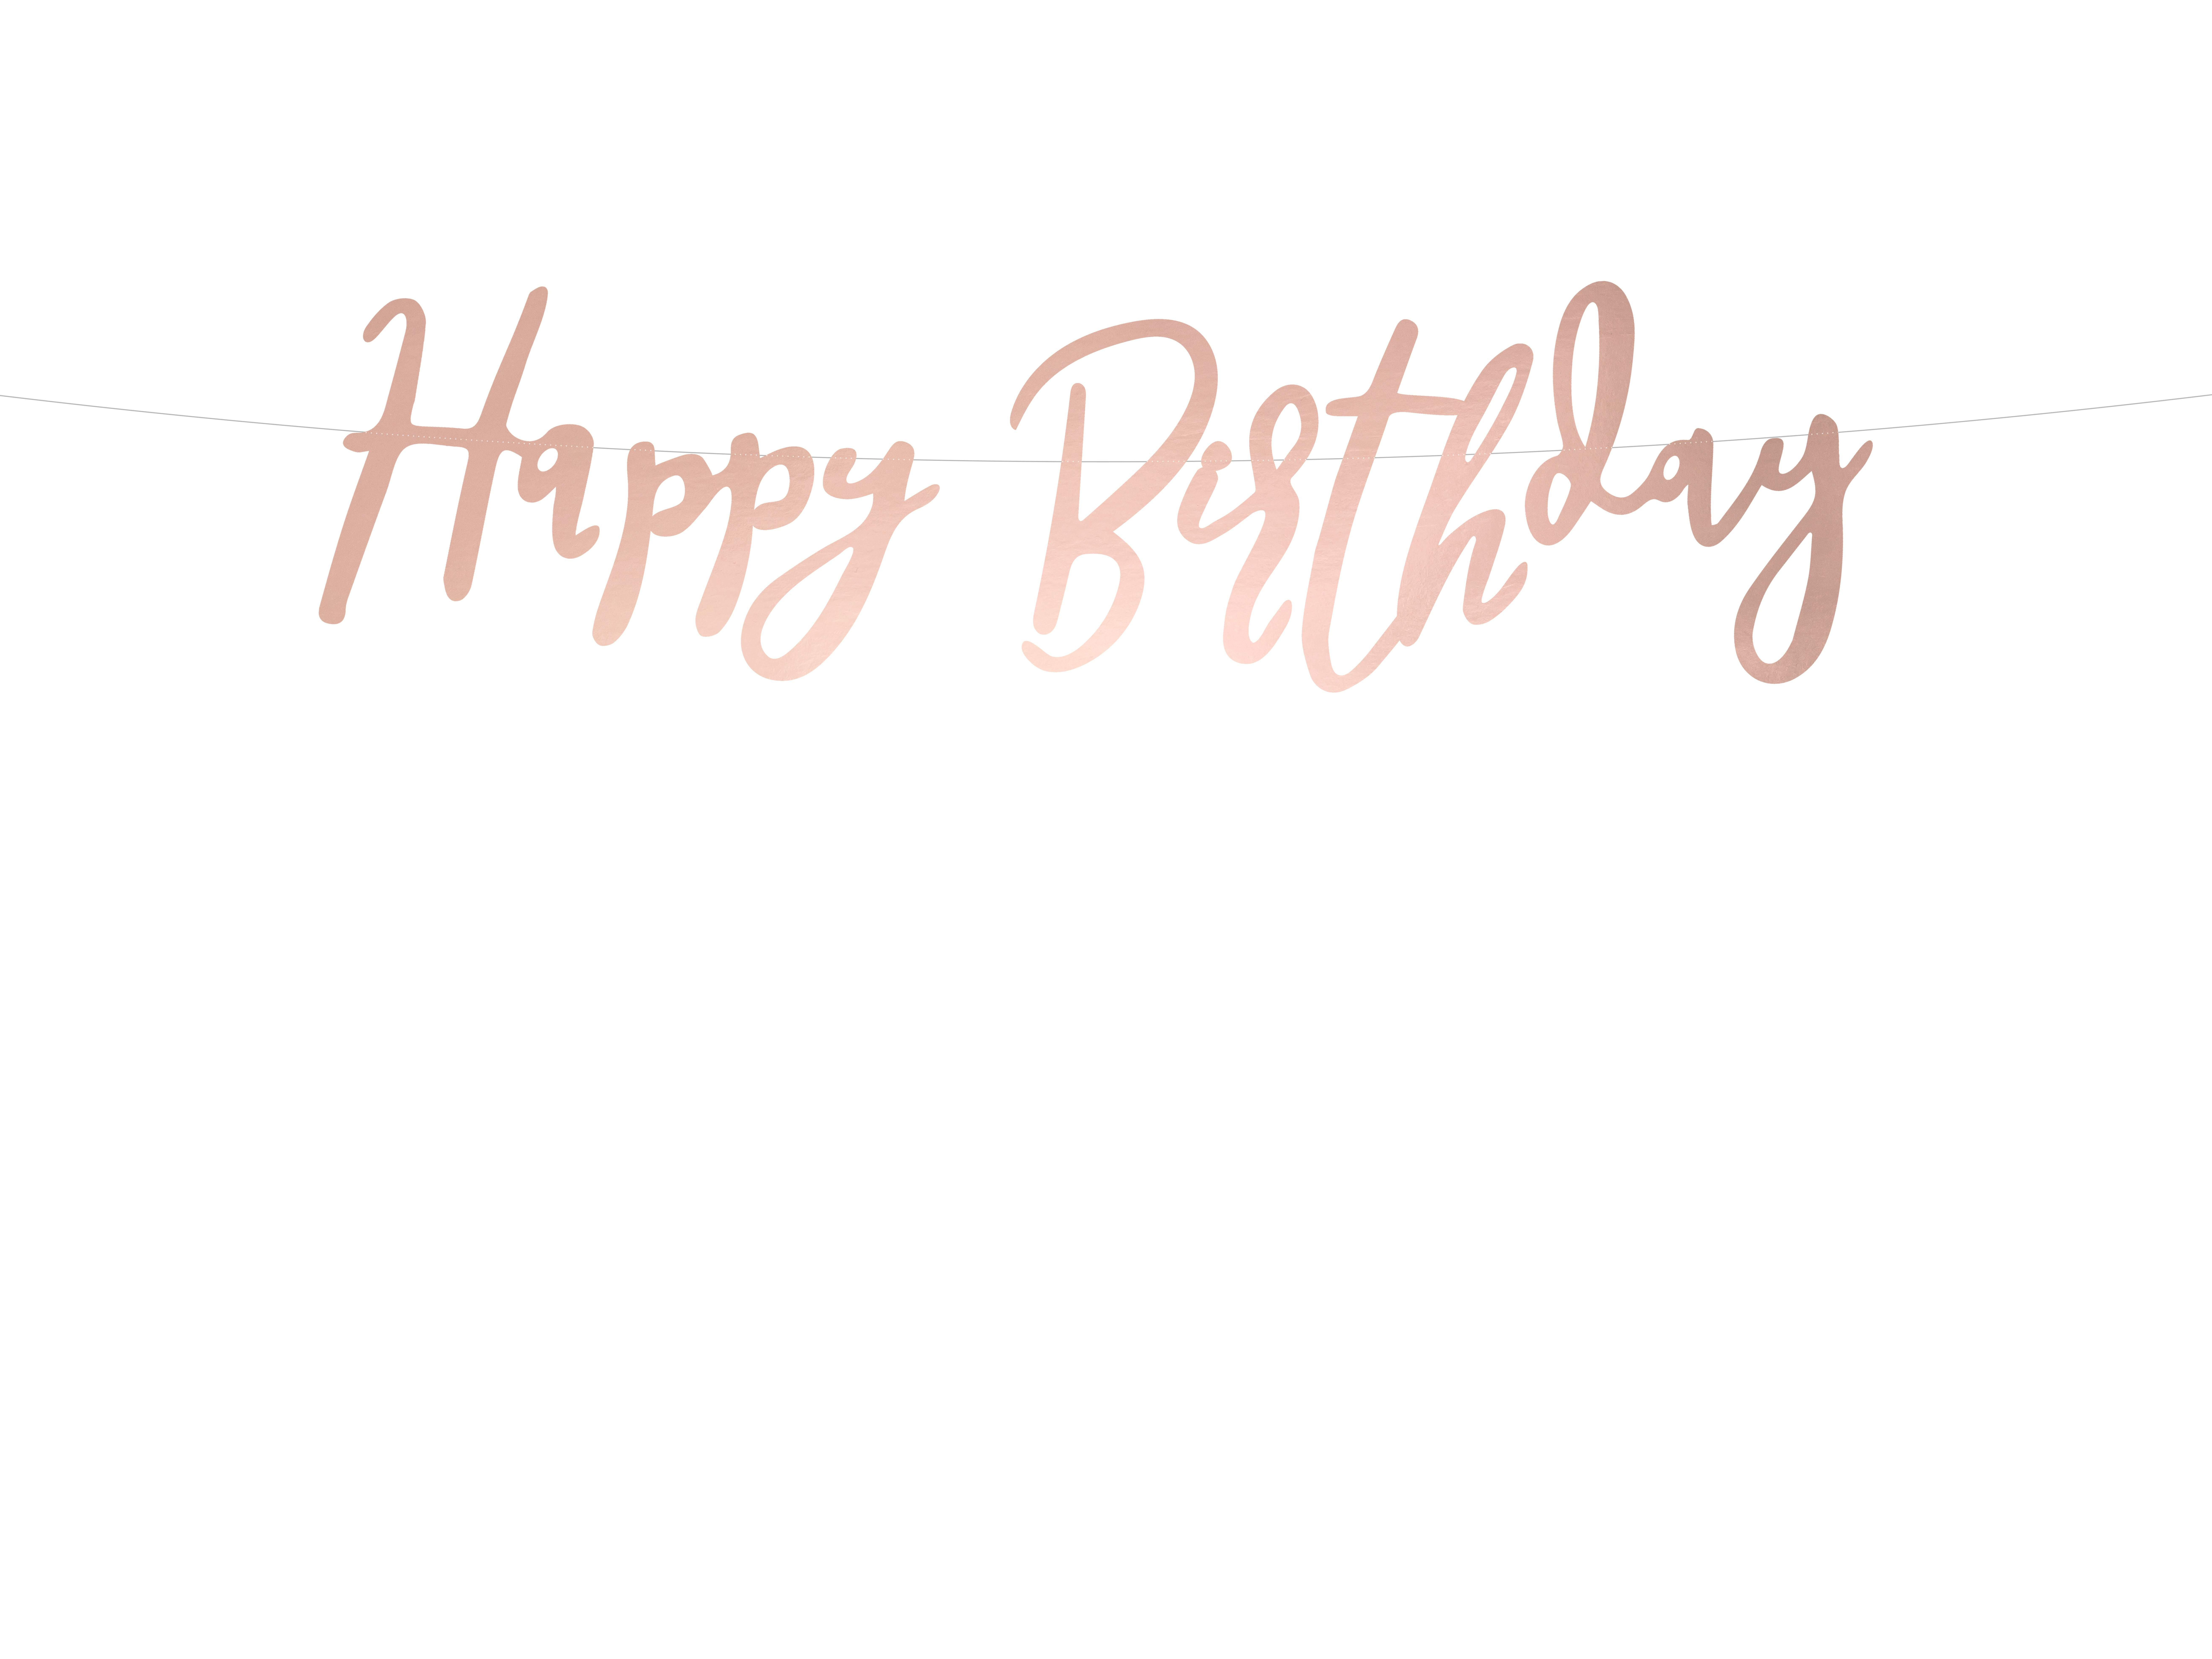 baner happy birthday golden rose, różowe złoto, złoty róż, baner urodzinowy różowe złoto, złoty róż